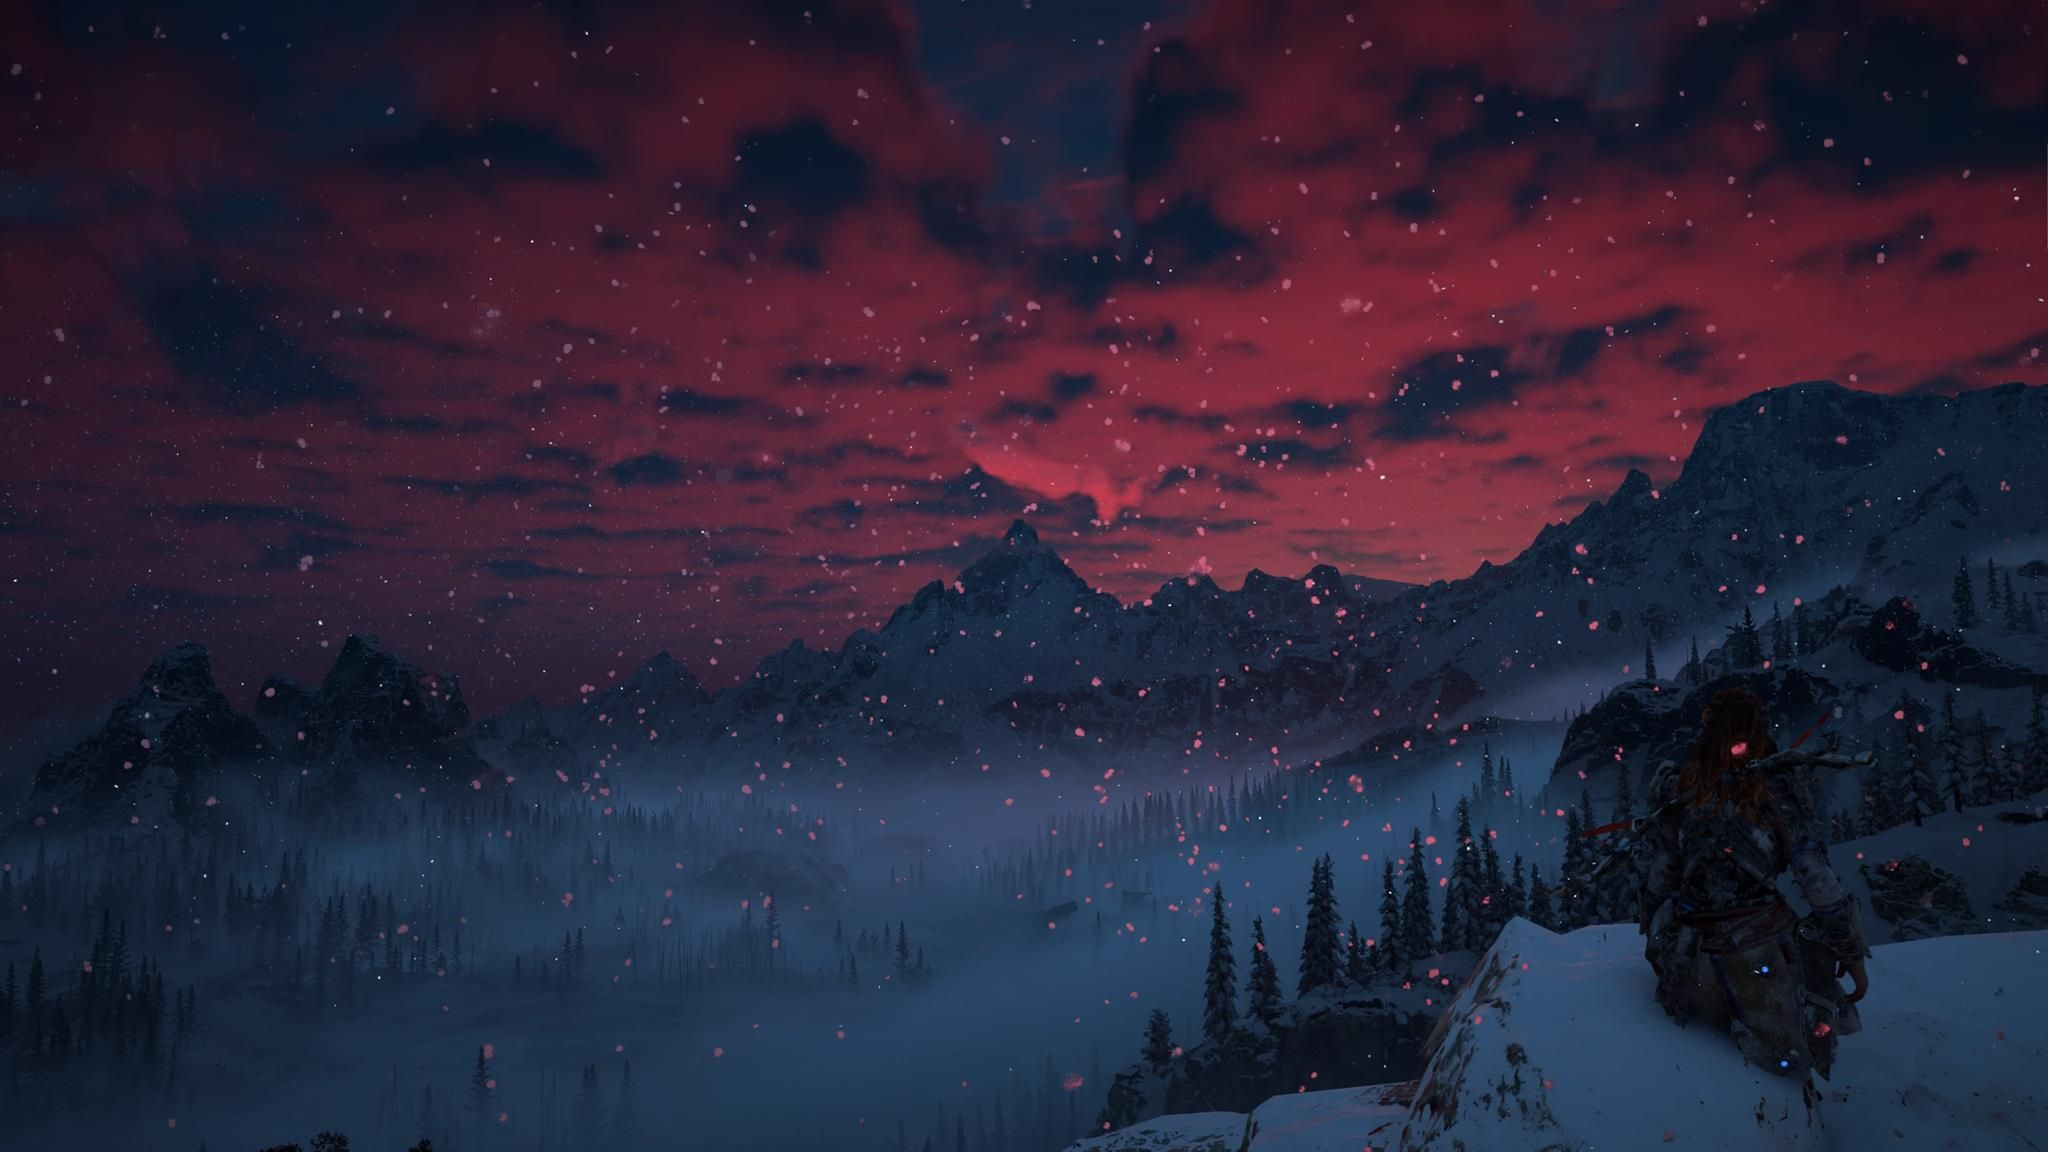 [Horizon Zero Dawn] [Screenshot] Red Sky Over Mountains in The Frozen Wilds.